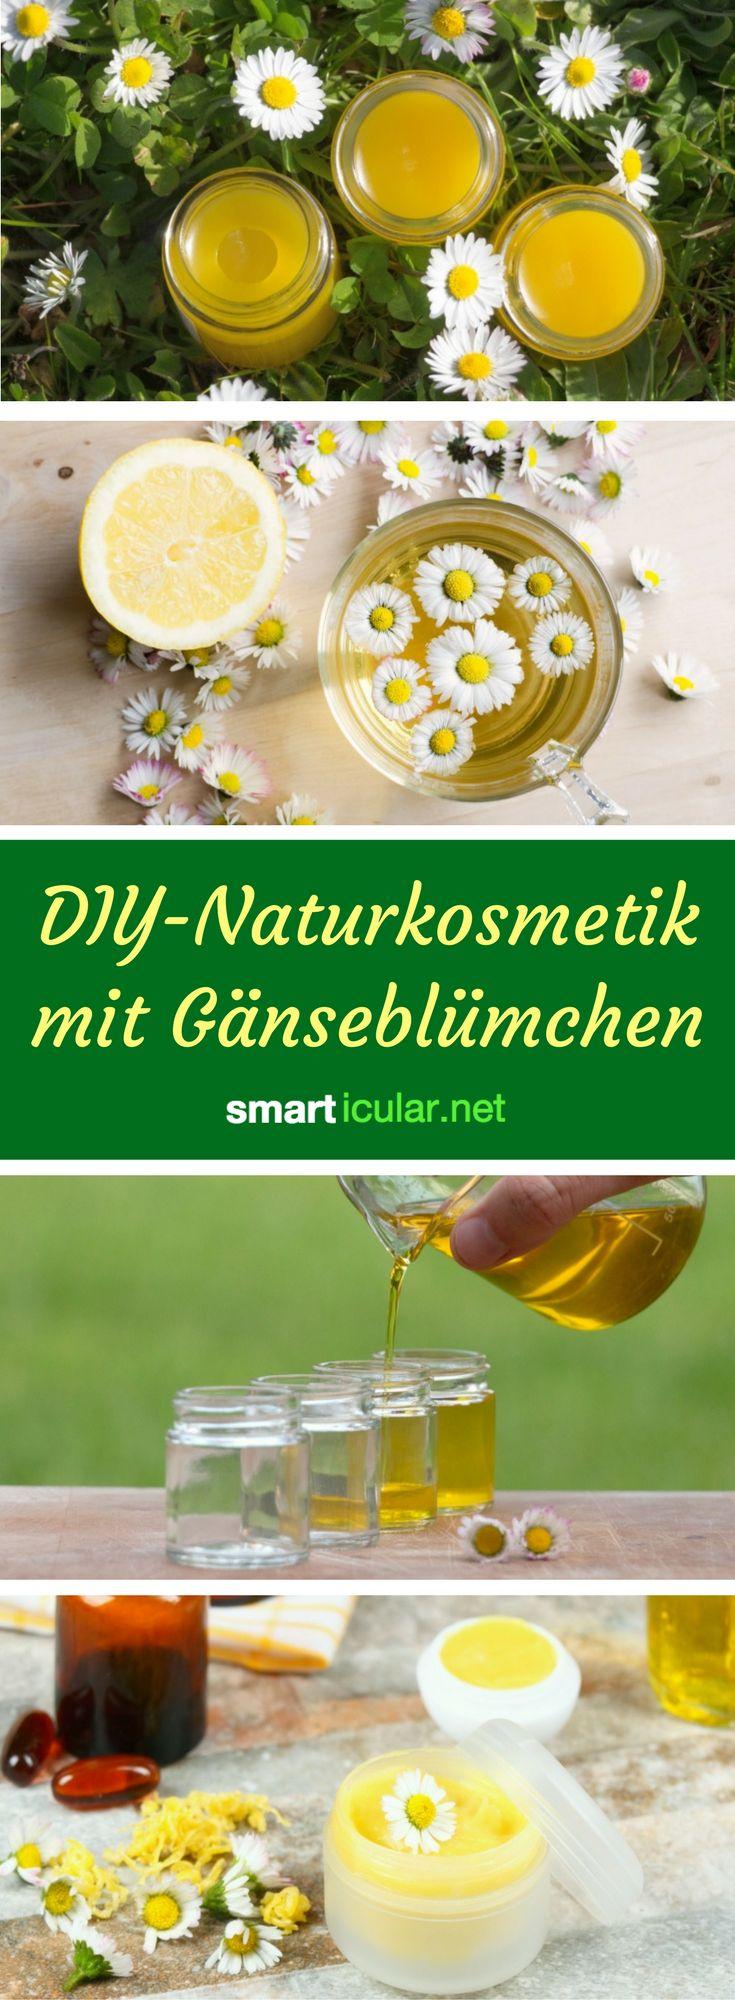 Naturkosmetik aus Gänseblümchen: All das kannst du aus den heilsamen Blüten machen